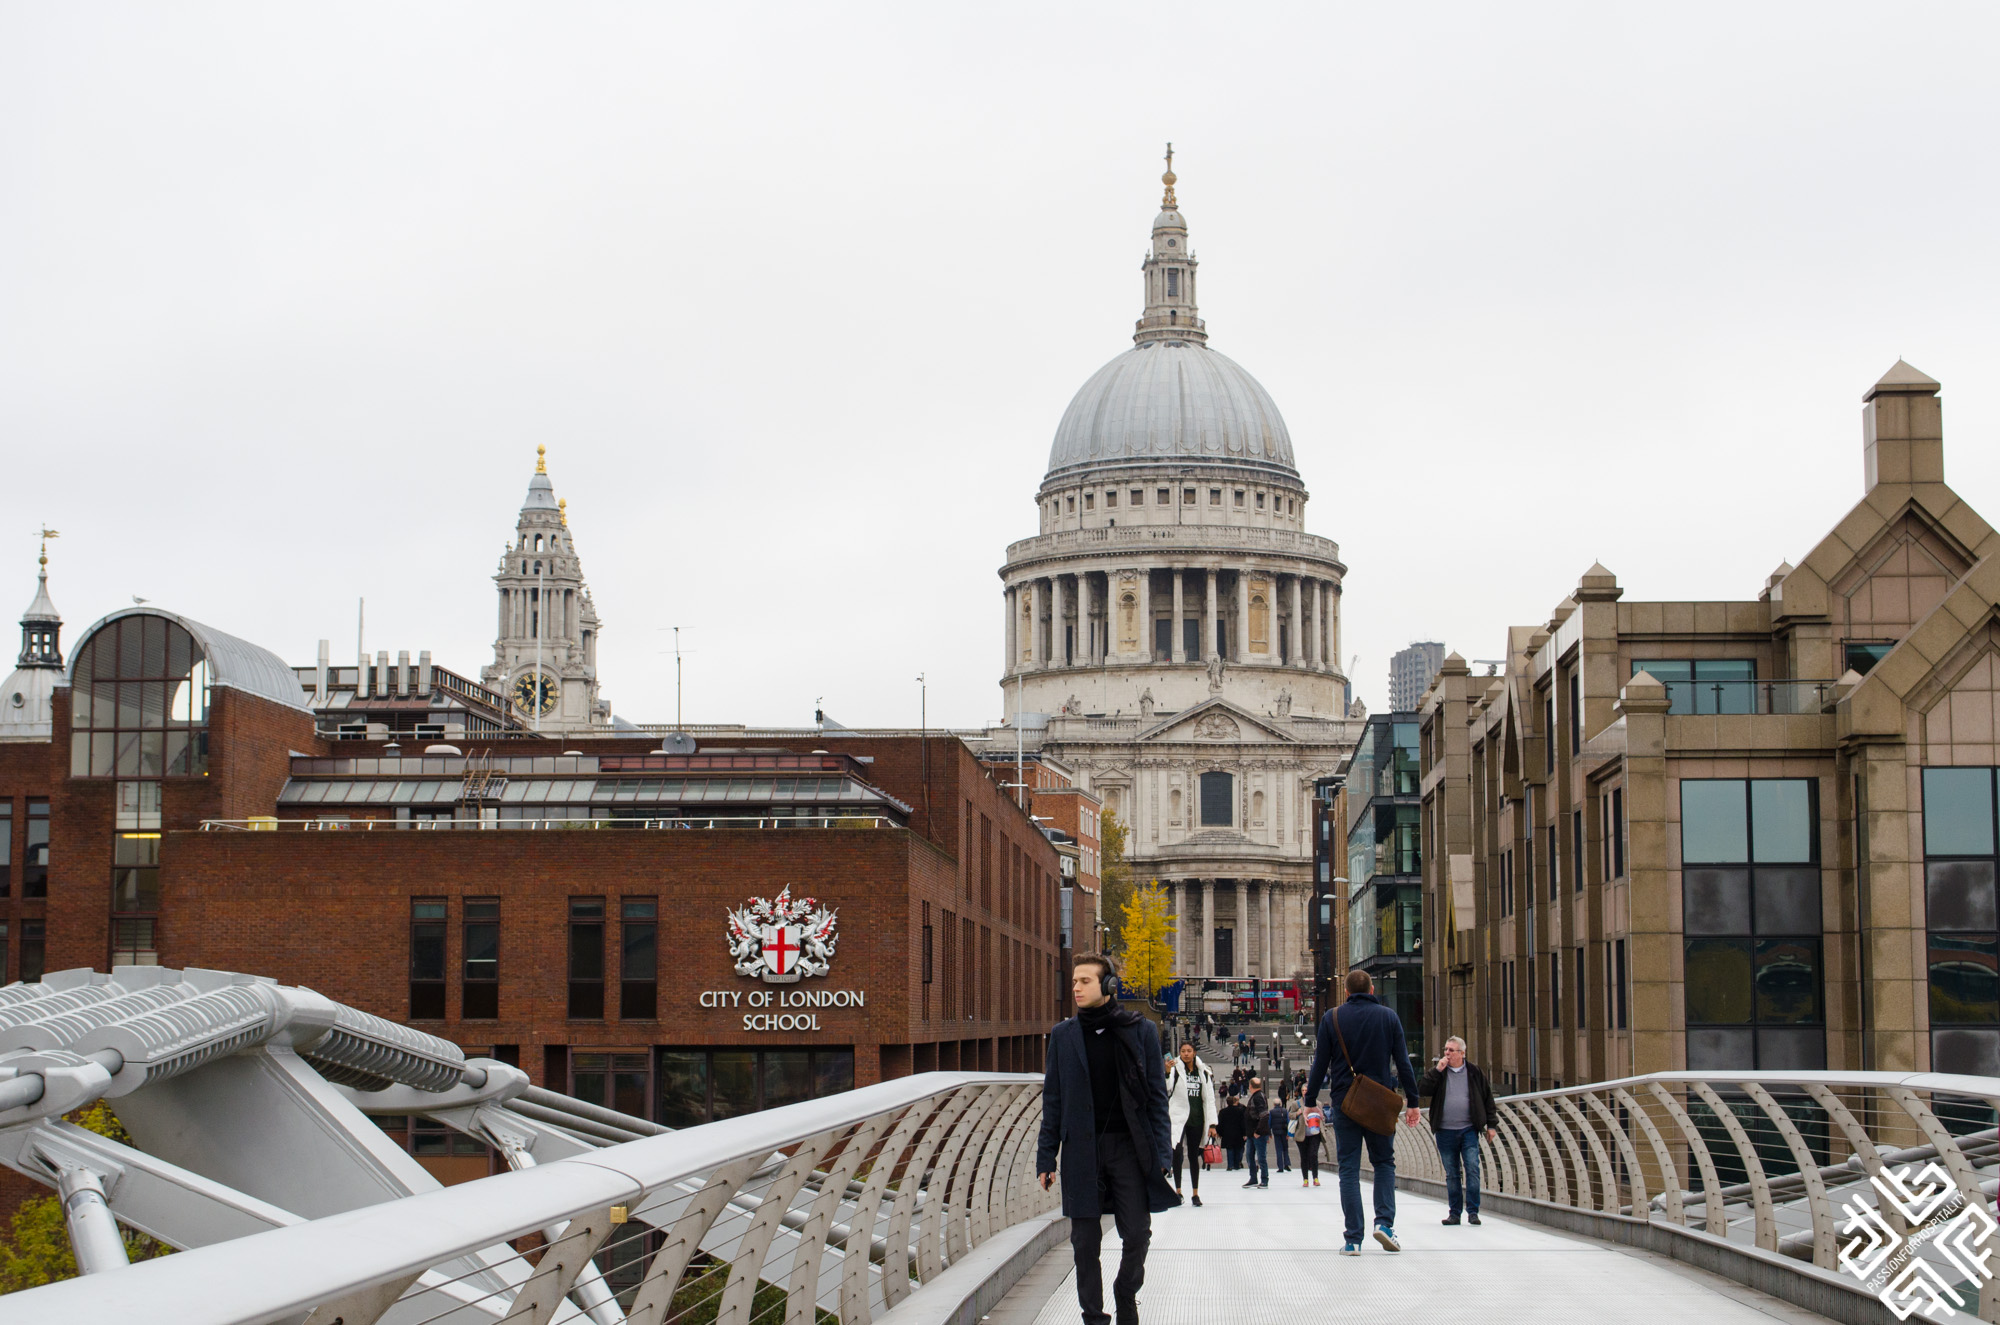 blue-badge-guide-city-of-london-tour-30